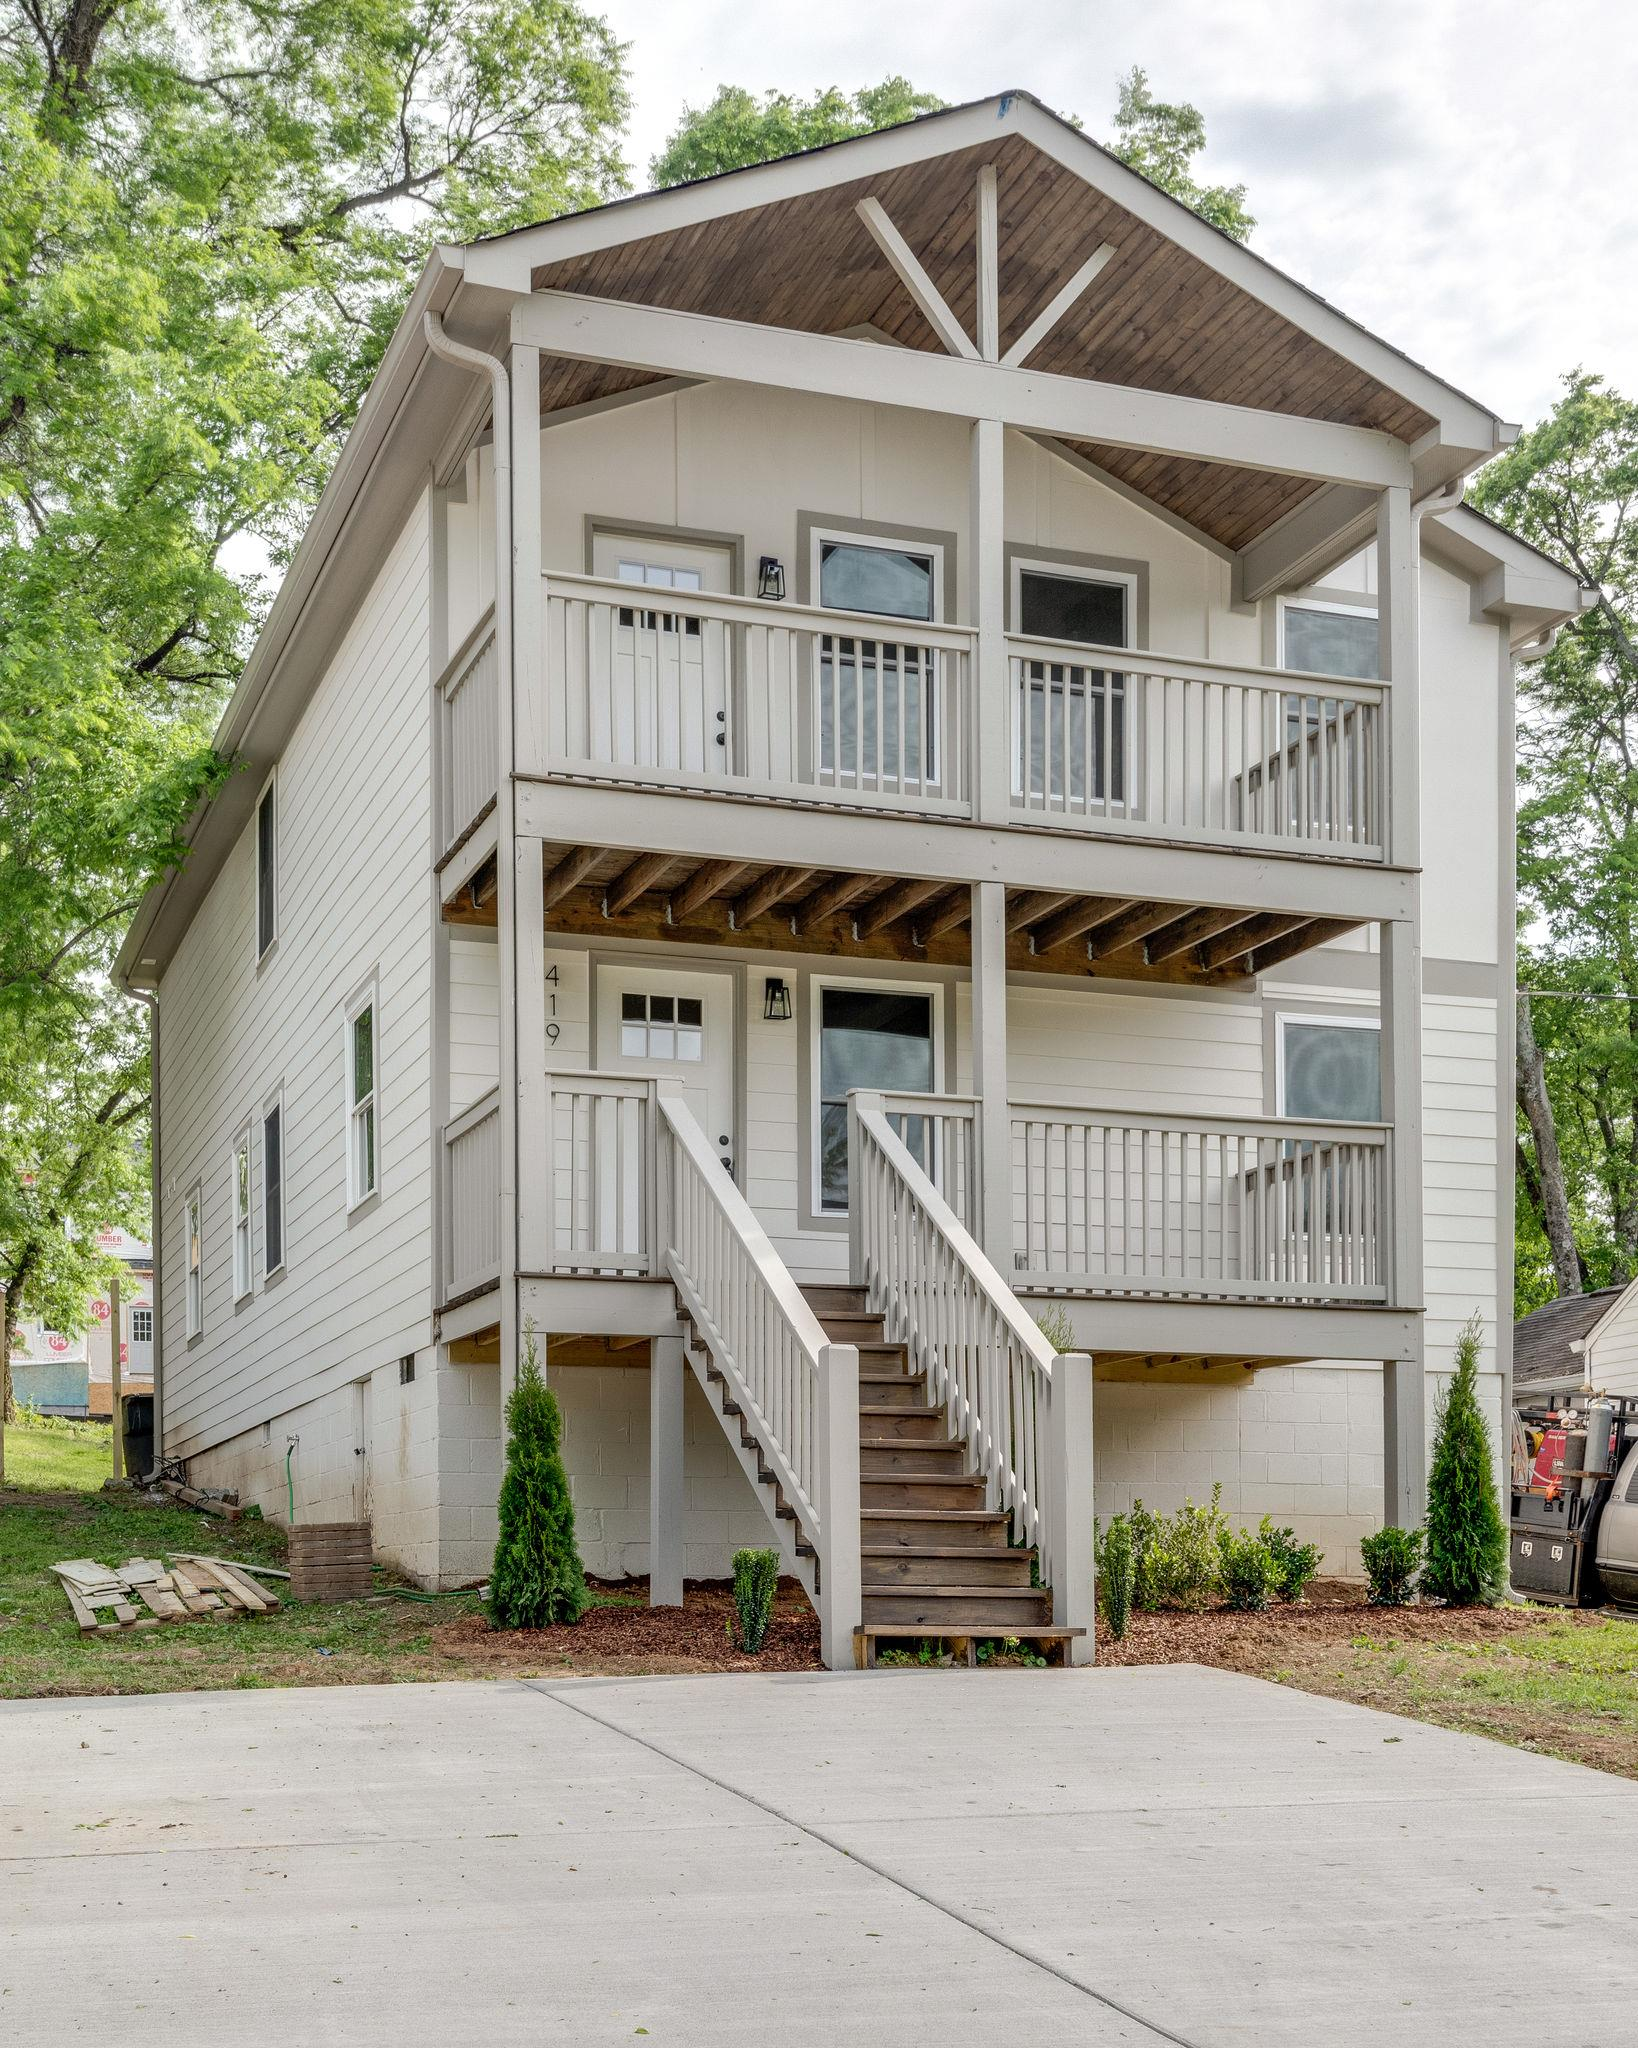 419 McIver St, Nashville, TN 37211 - Nashville, TN real estate listing